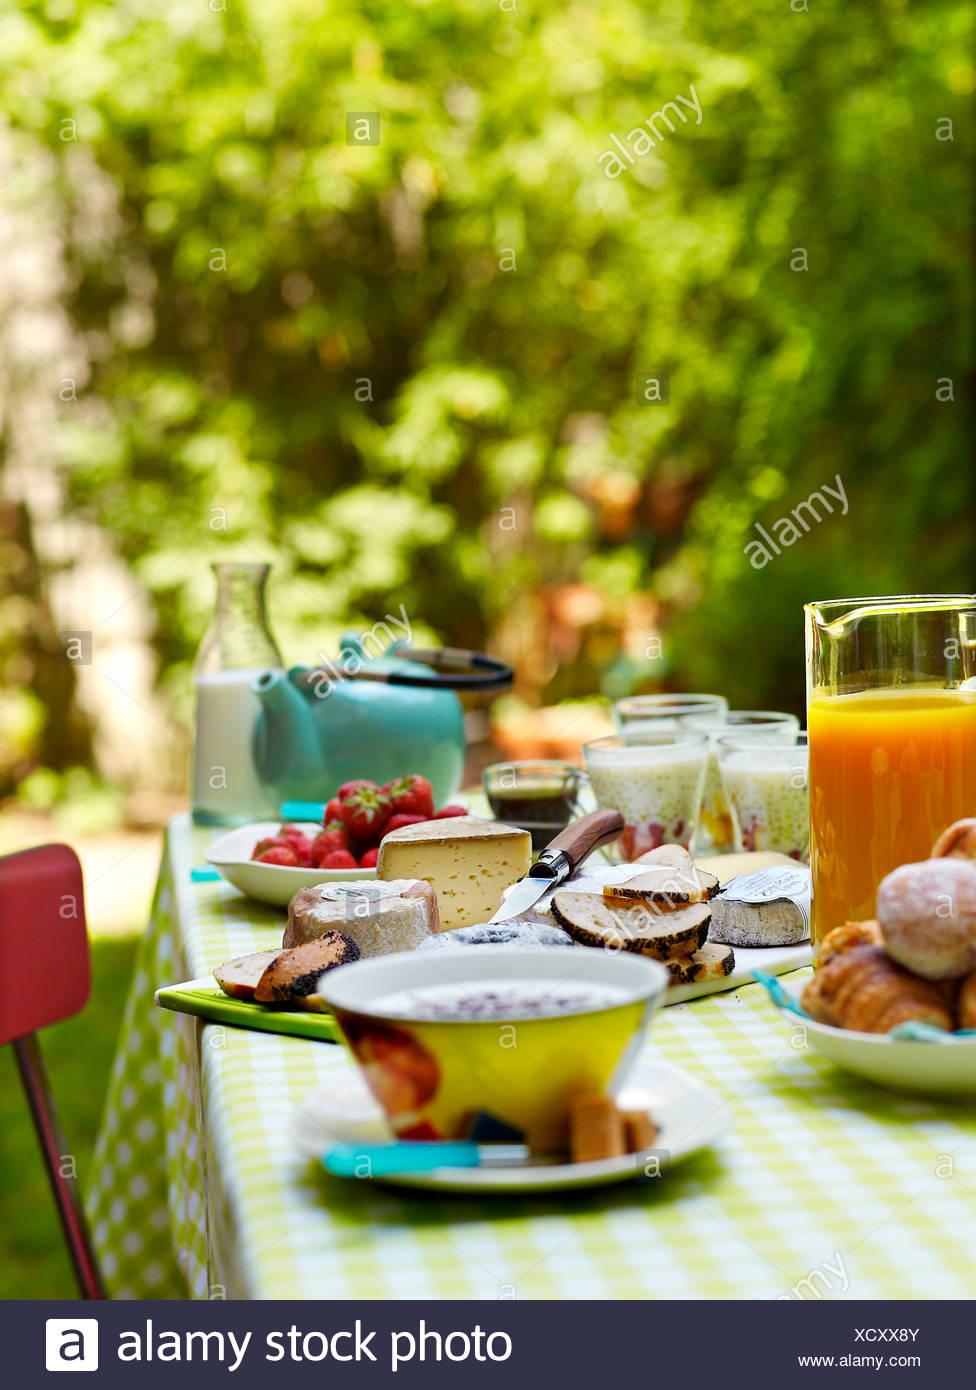 Breakfast table in the garden Stock Photo: 283333147 - Alamy